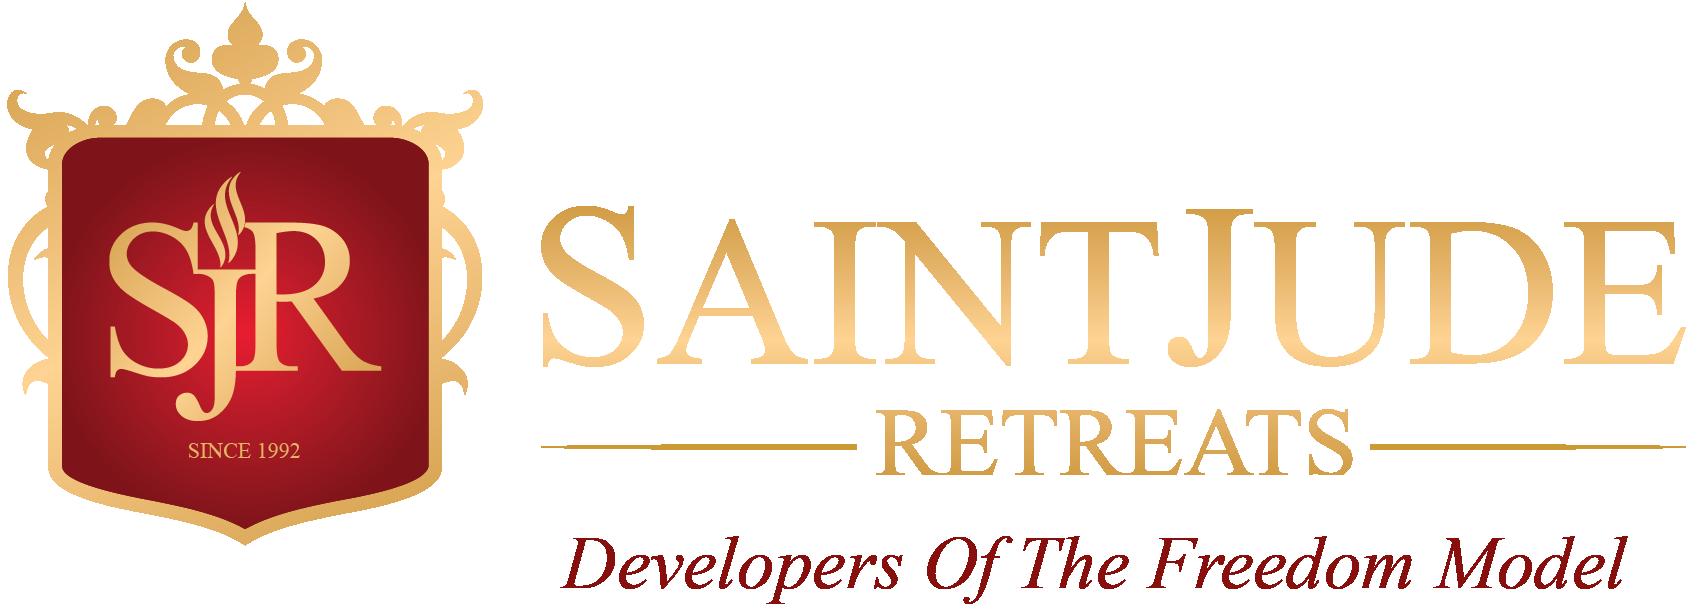 saint-jude-retreat-addiction-help